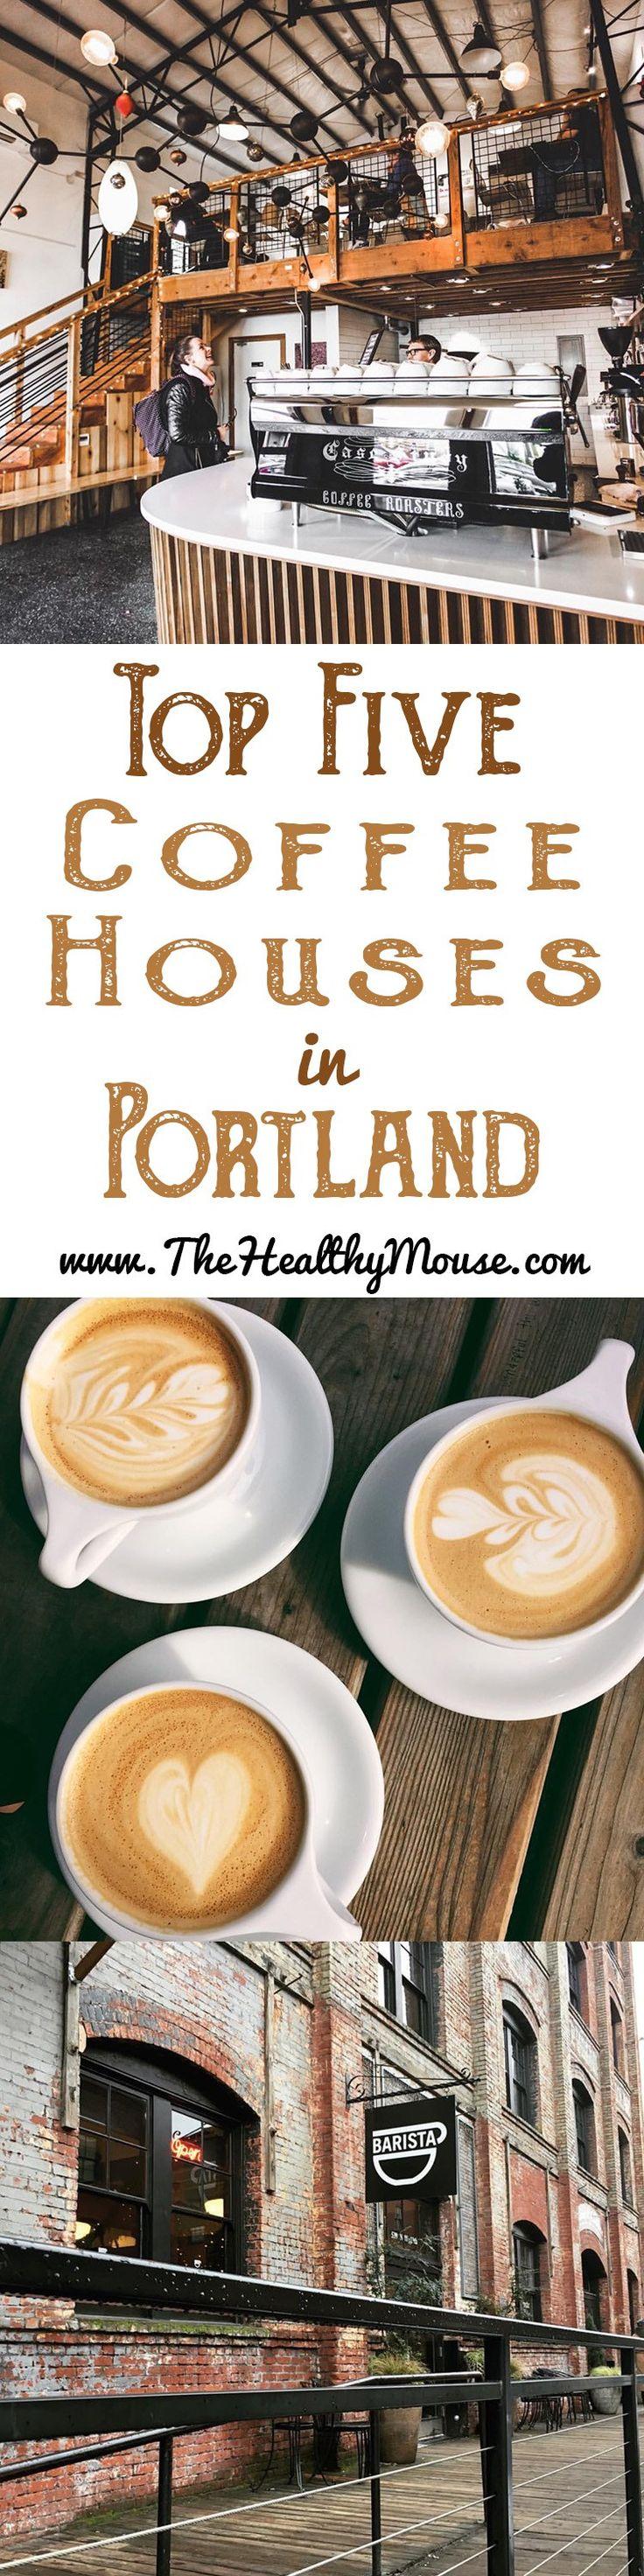 Top 5 Coffee Houses in Portland, Oregon